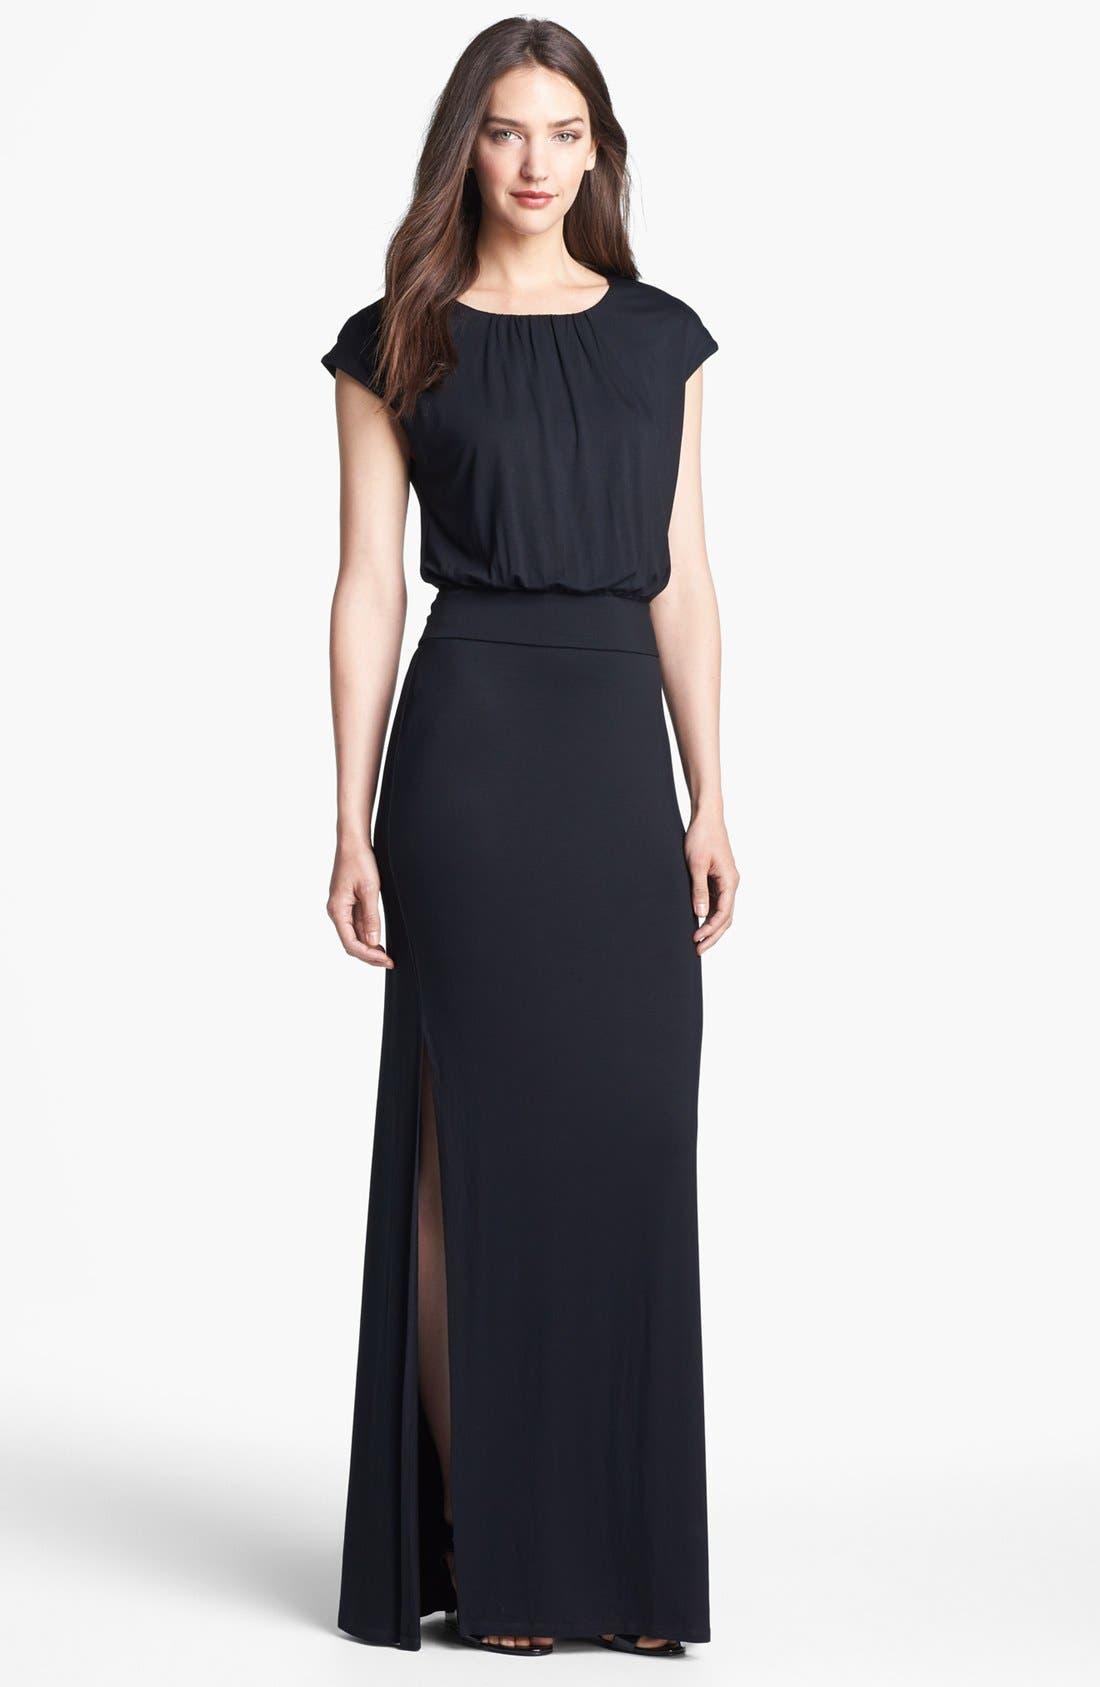 Felicity & Coco 'Vienna' Blouson Maxi Dress (Nordstrom Exclusive)